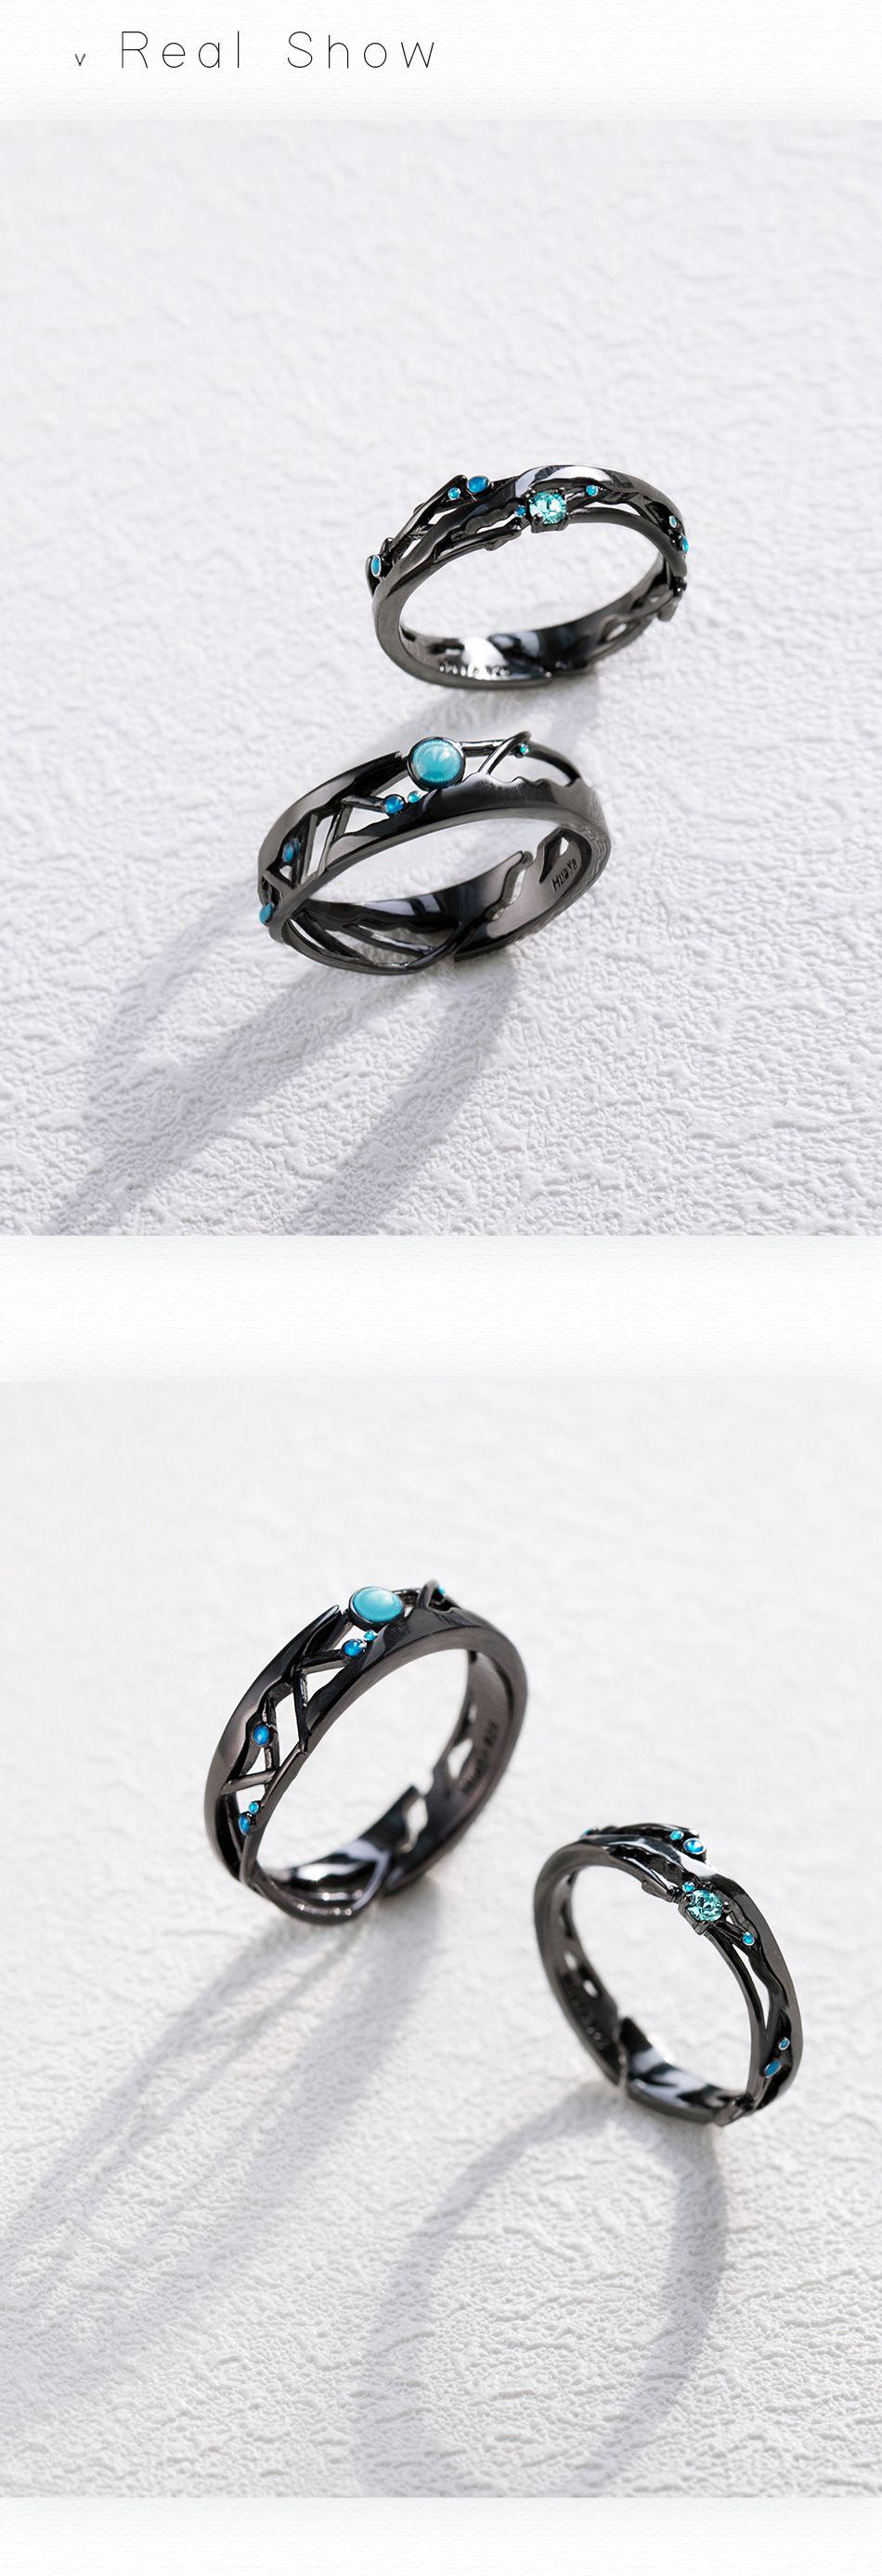 Thaya Encounter Blue Zircon Star Black Rings Zircon Gemstone rings